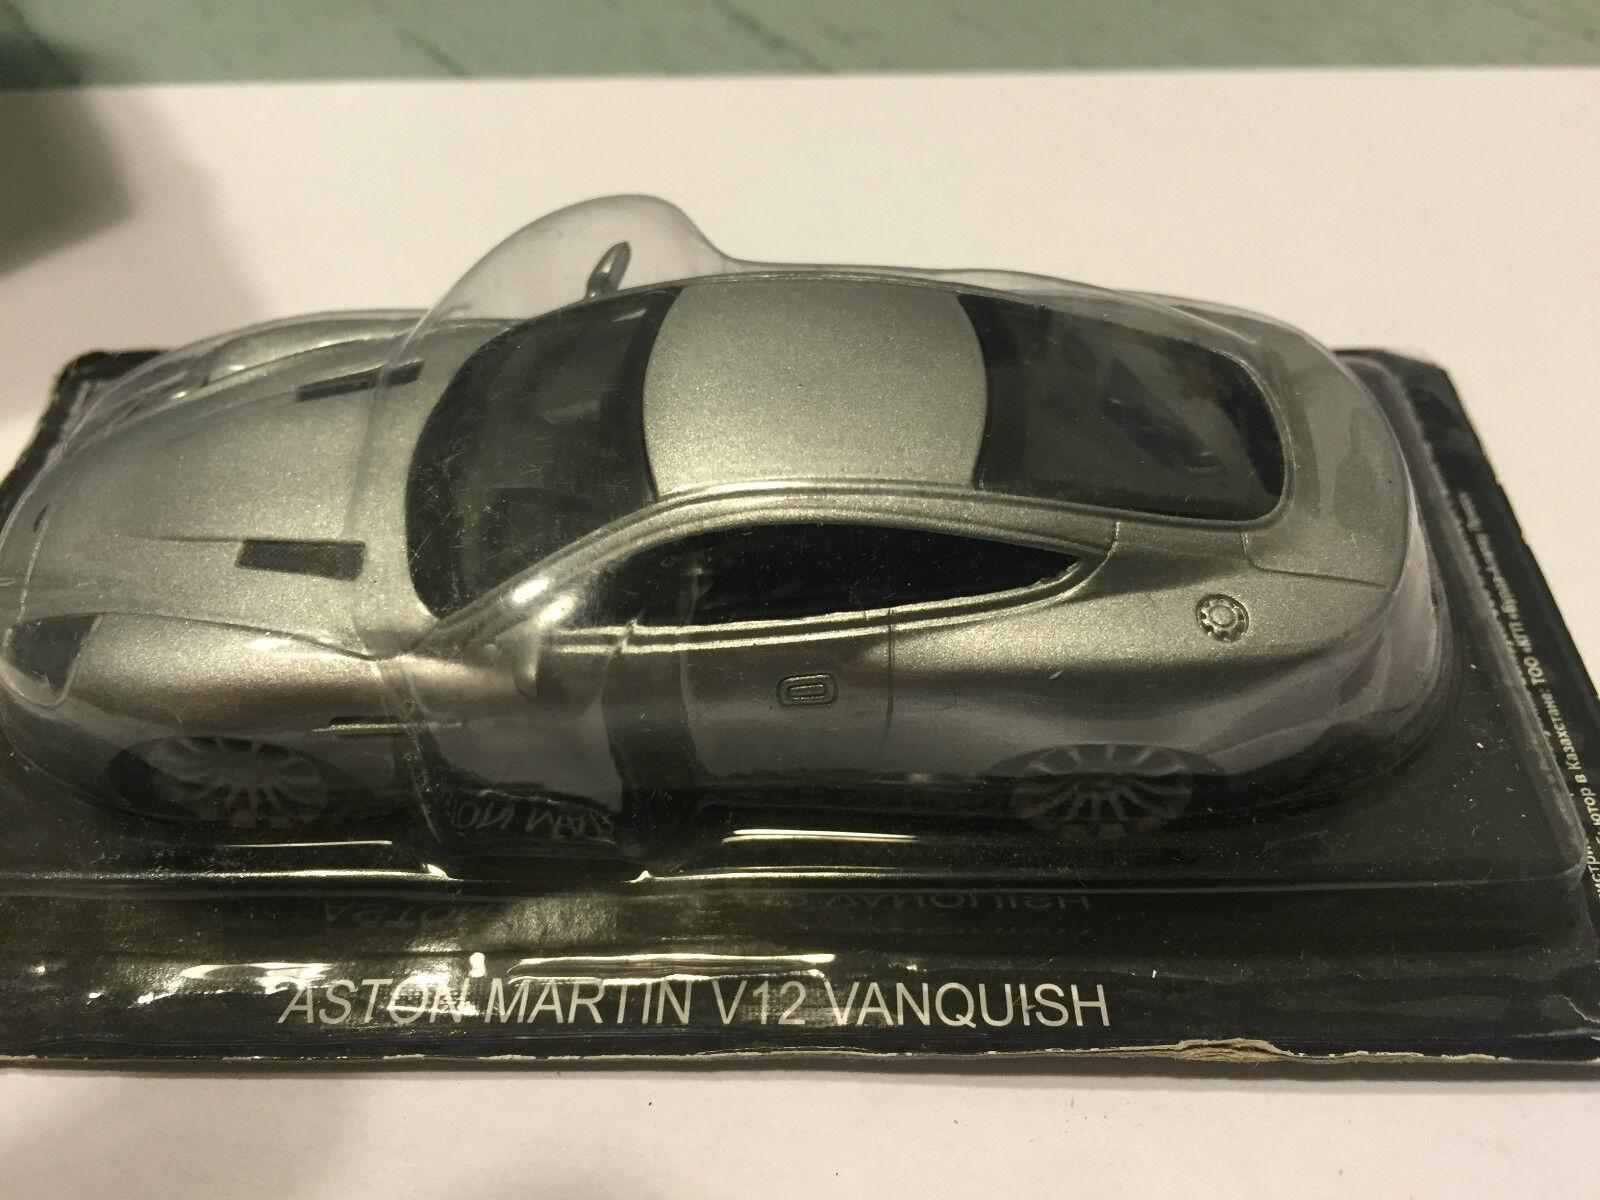 STERBEN CAST CAST CAST   ASTON MARTIN V12 VANQUISH   DREAMS AUTO SKALA 1 43 3deffa